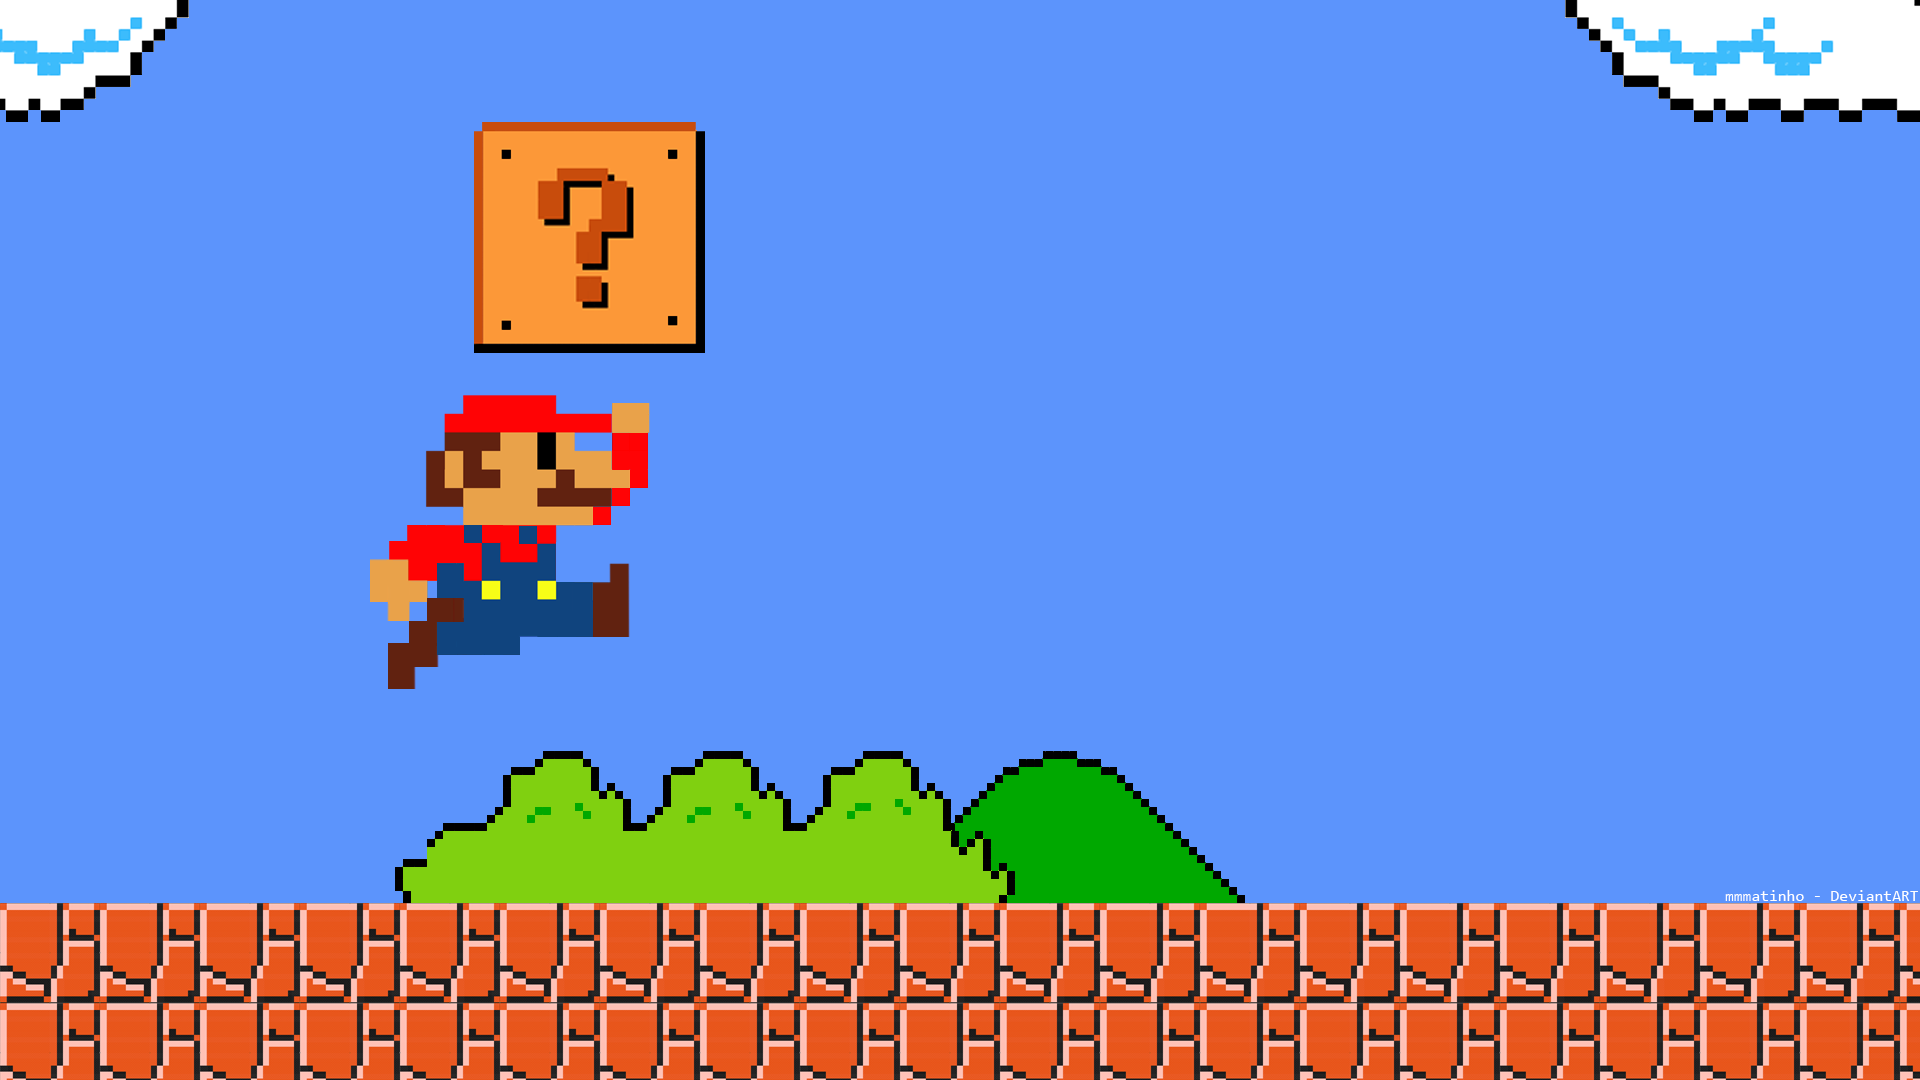 Images of Peach 8 Bit Mario Maker - #rock-cafe